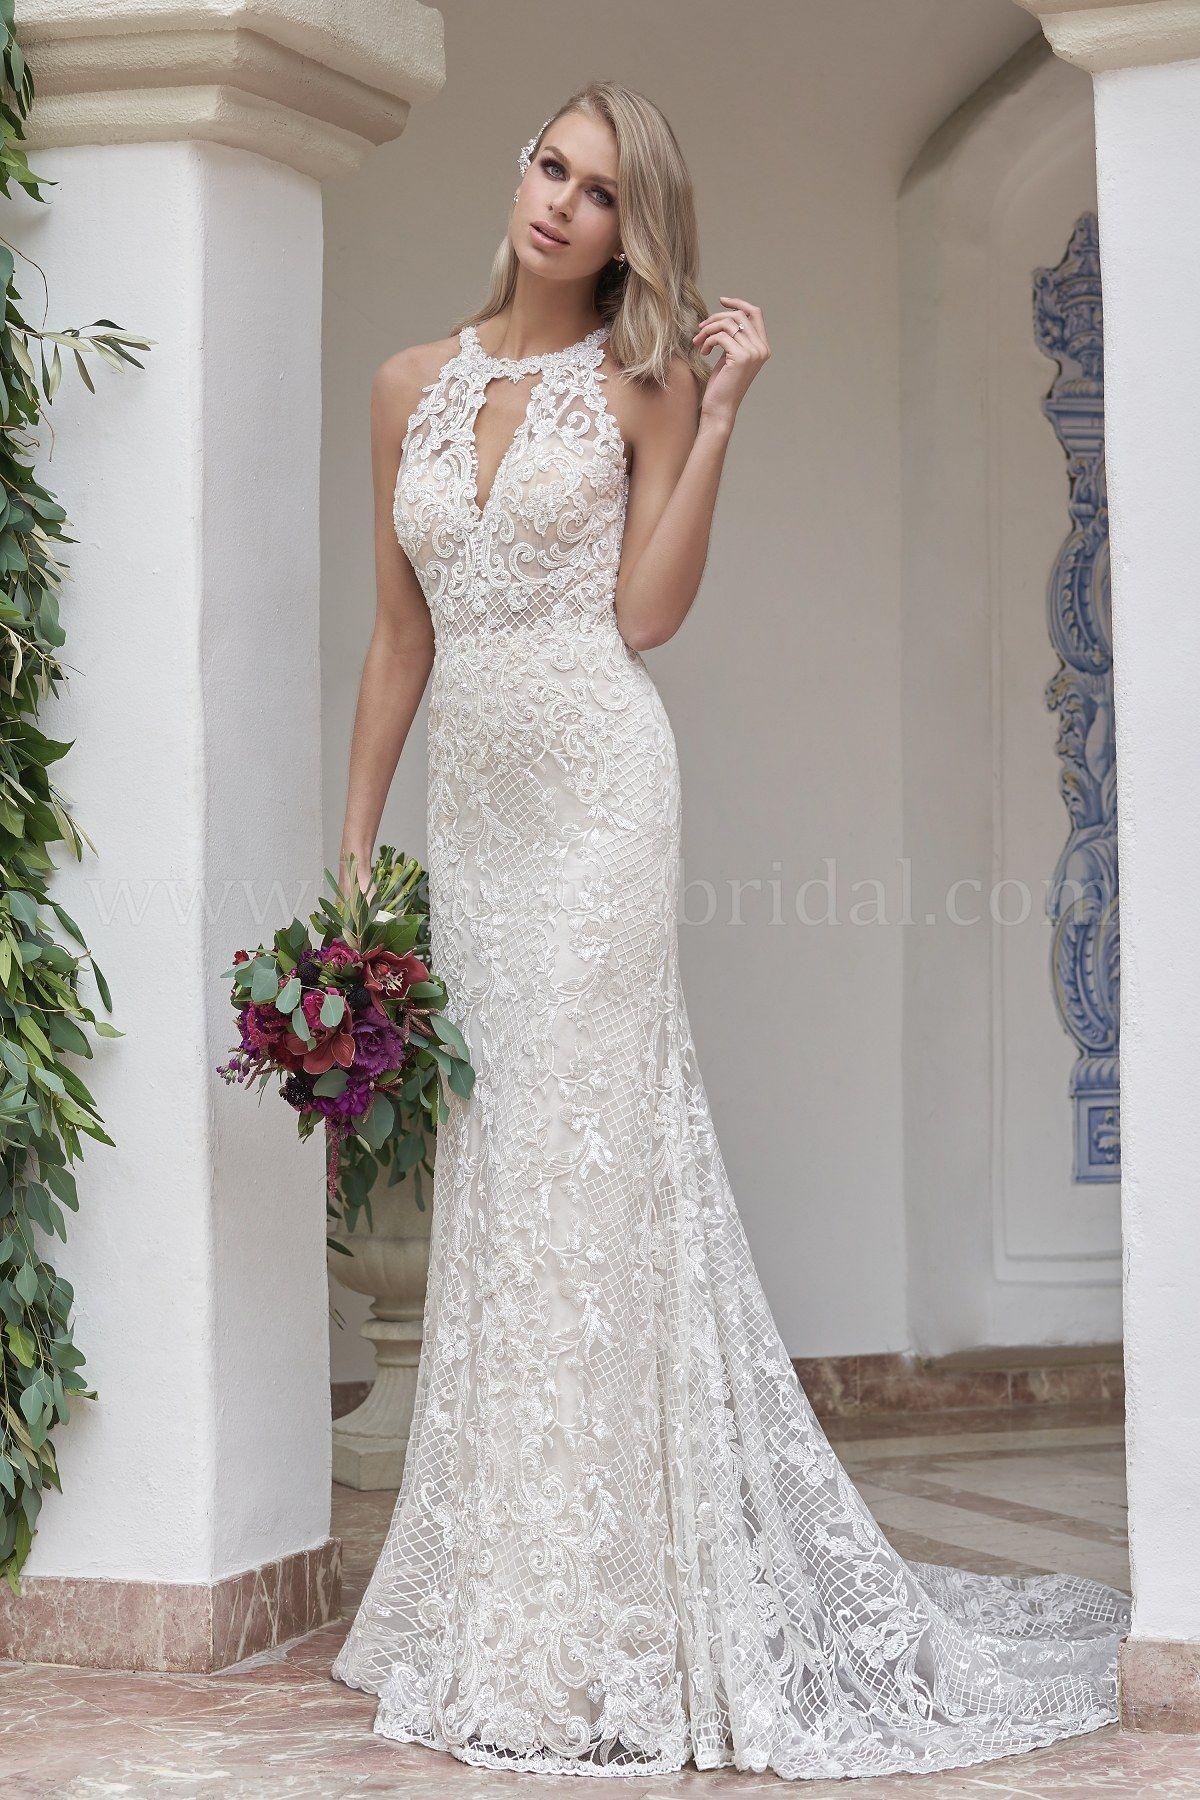 T202057 Illusion Bodice Halter Neckline Sequin Lace Silky Jersey Wedding Dress Wedding Dresses Wedding Dresses Lace Wedding Dresses With Straps